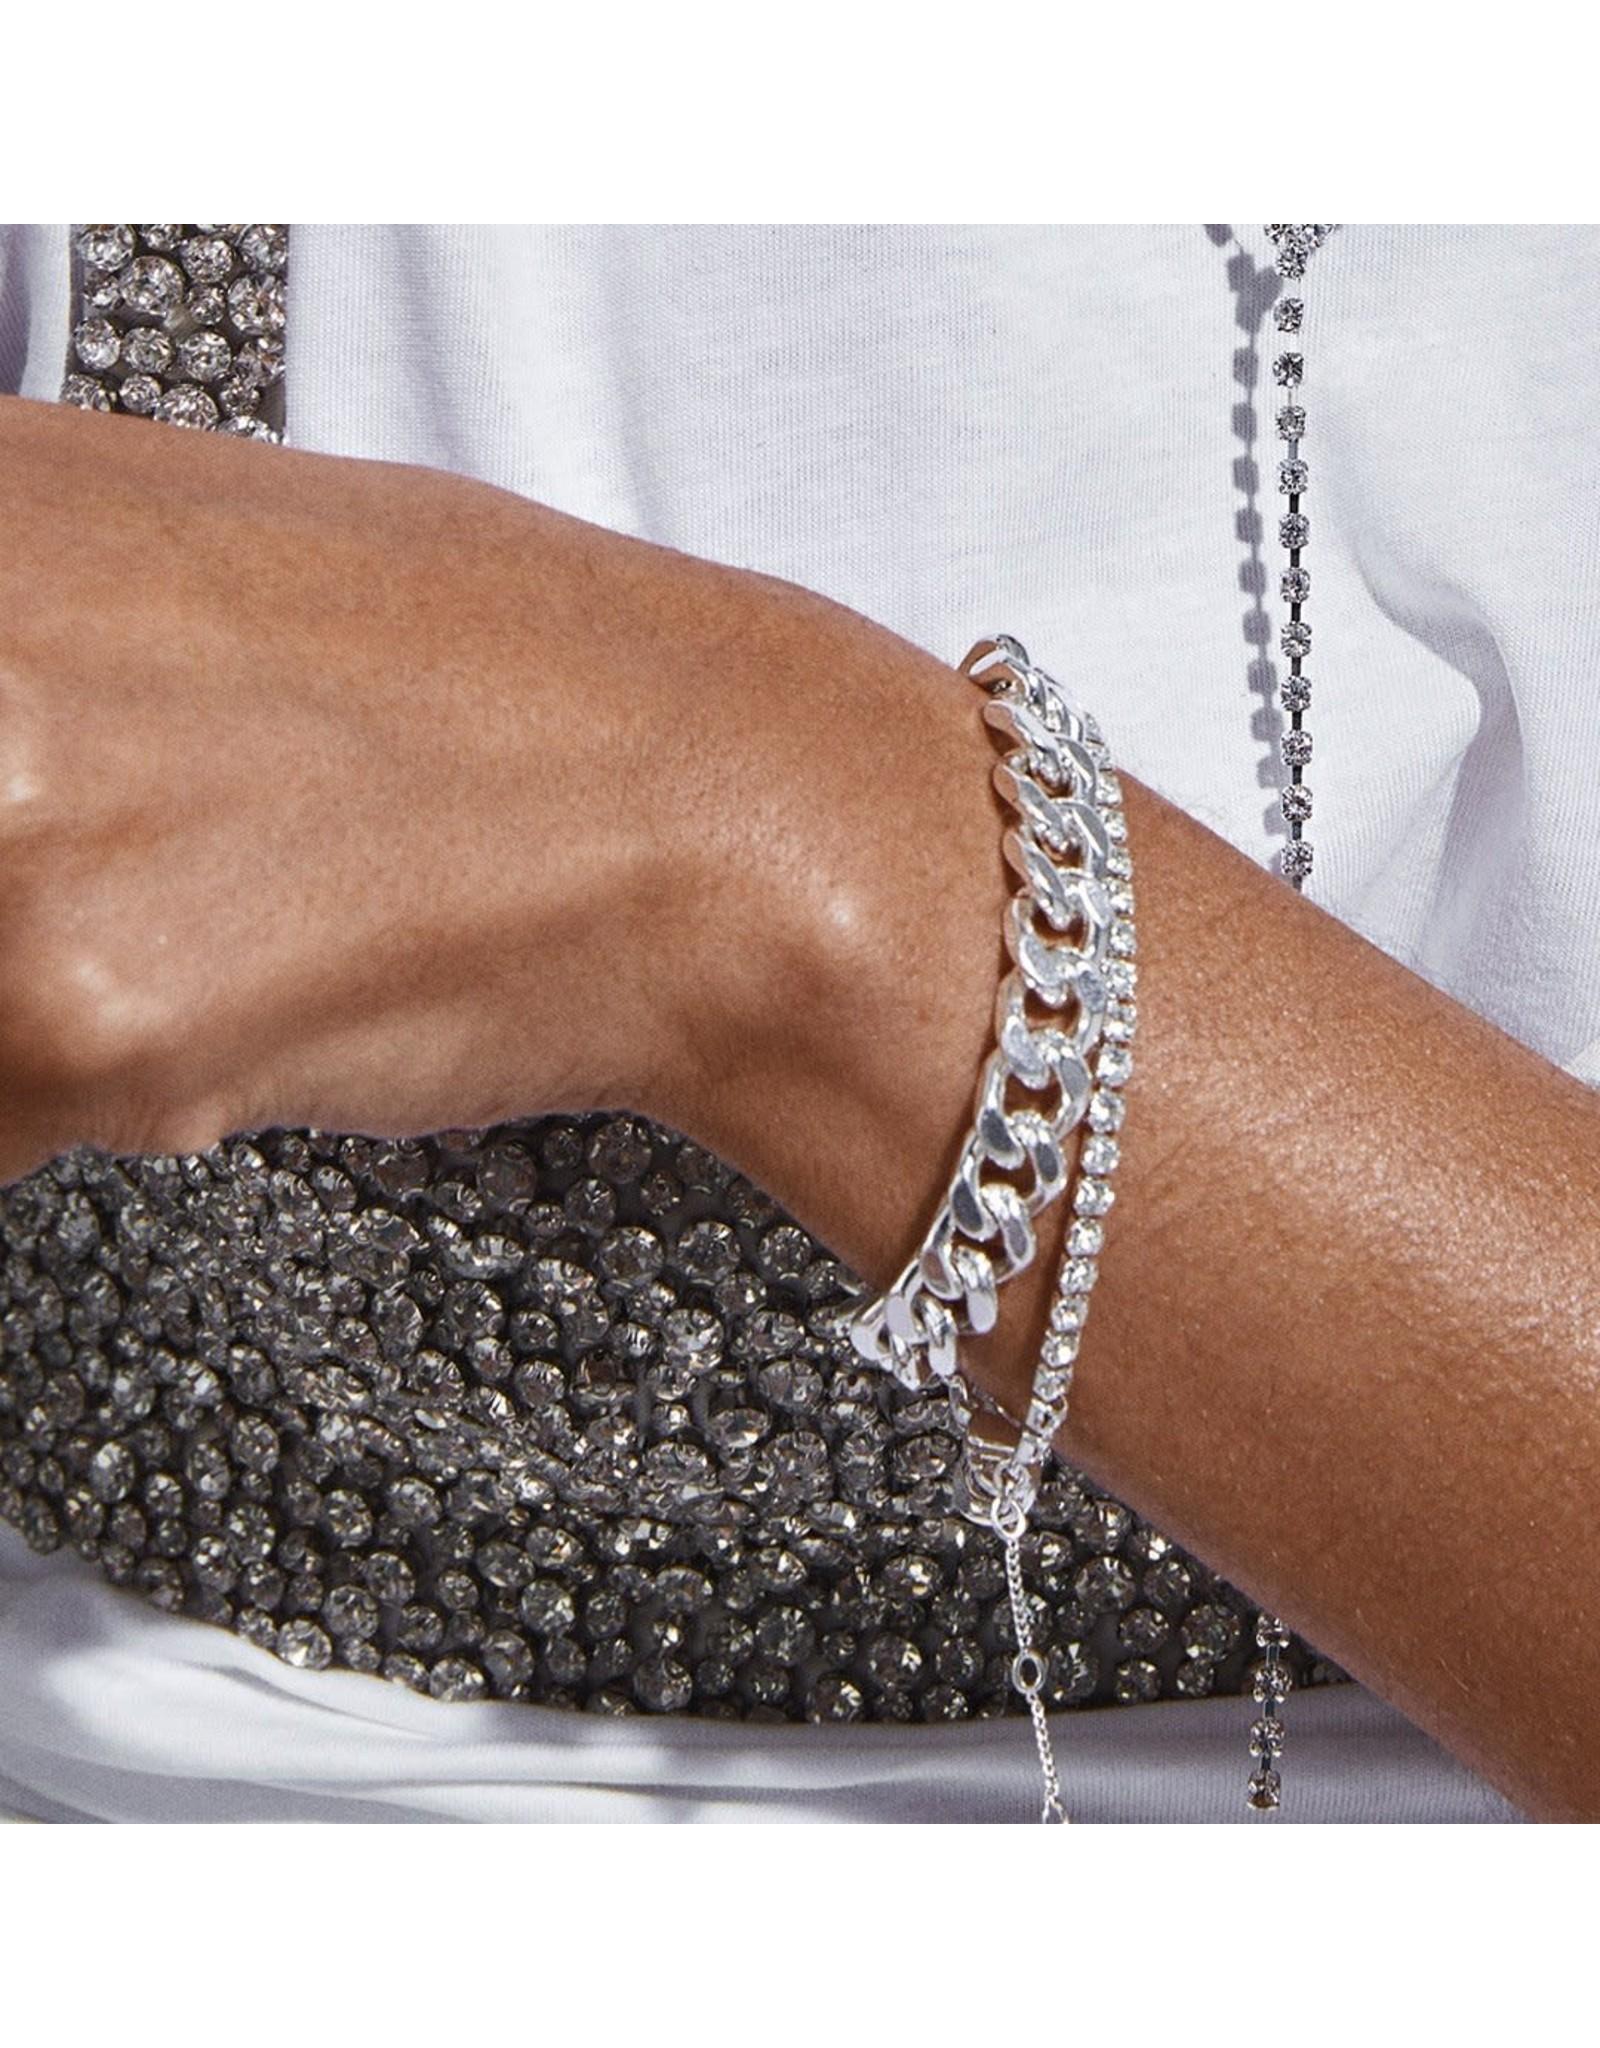 Pilgrim Pilgrim Radiance Bracelet Silver Plated Crystal